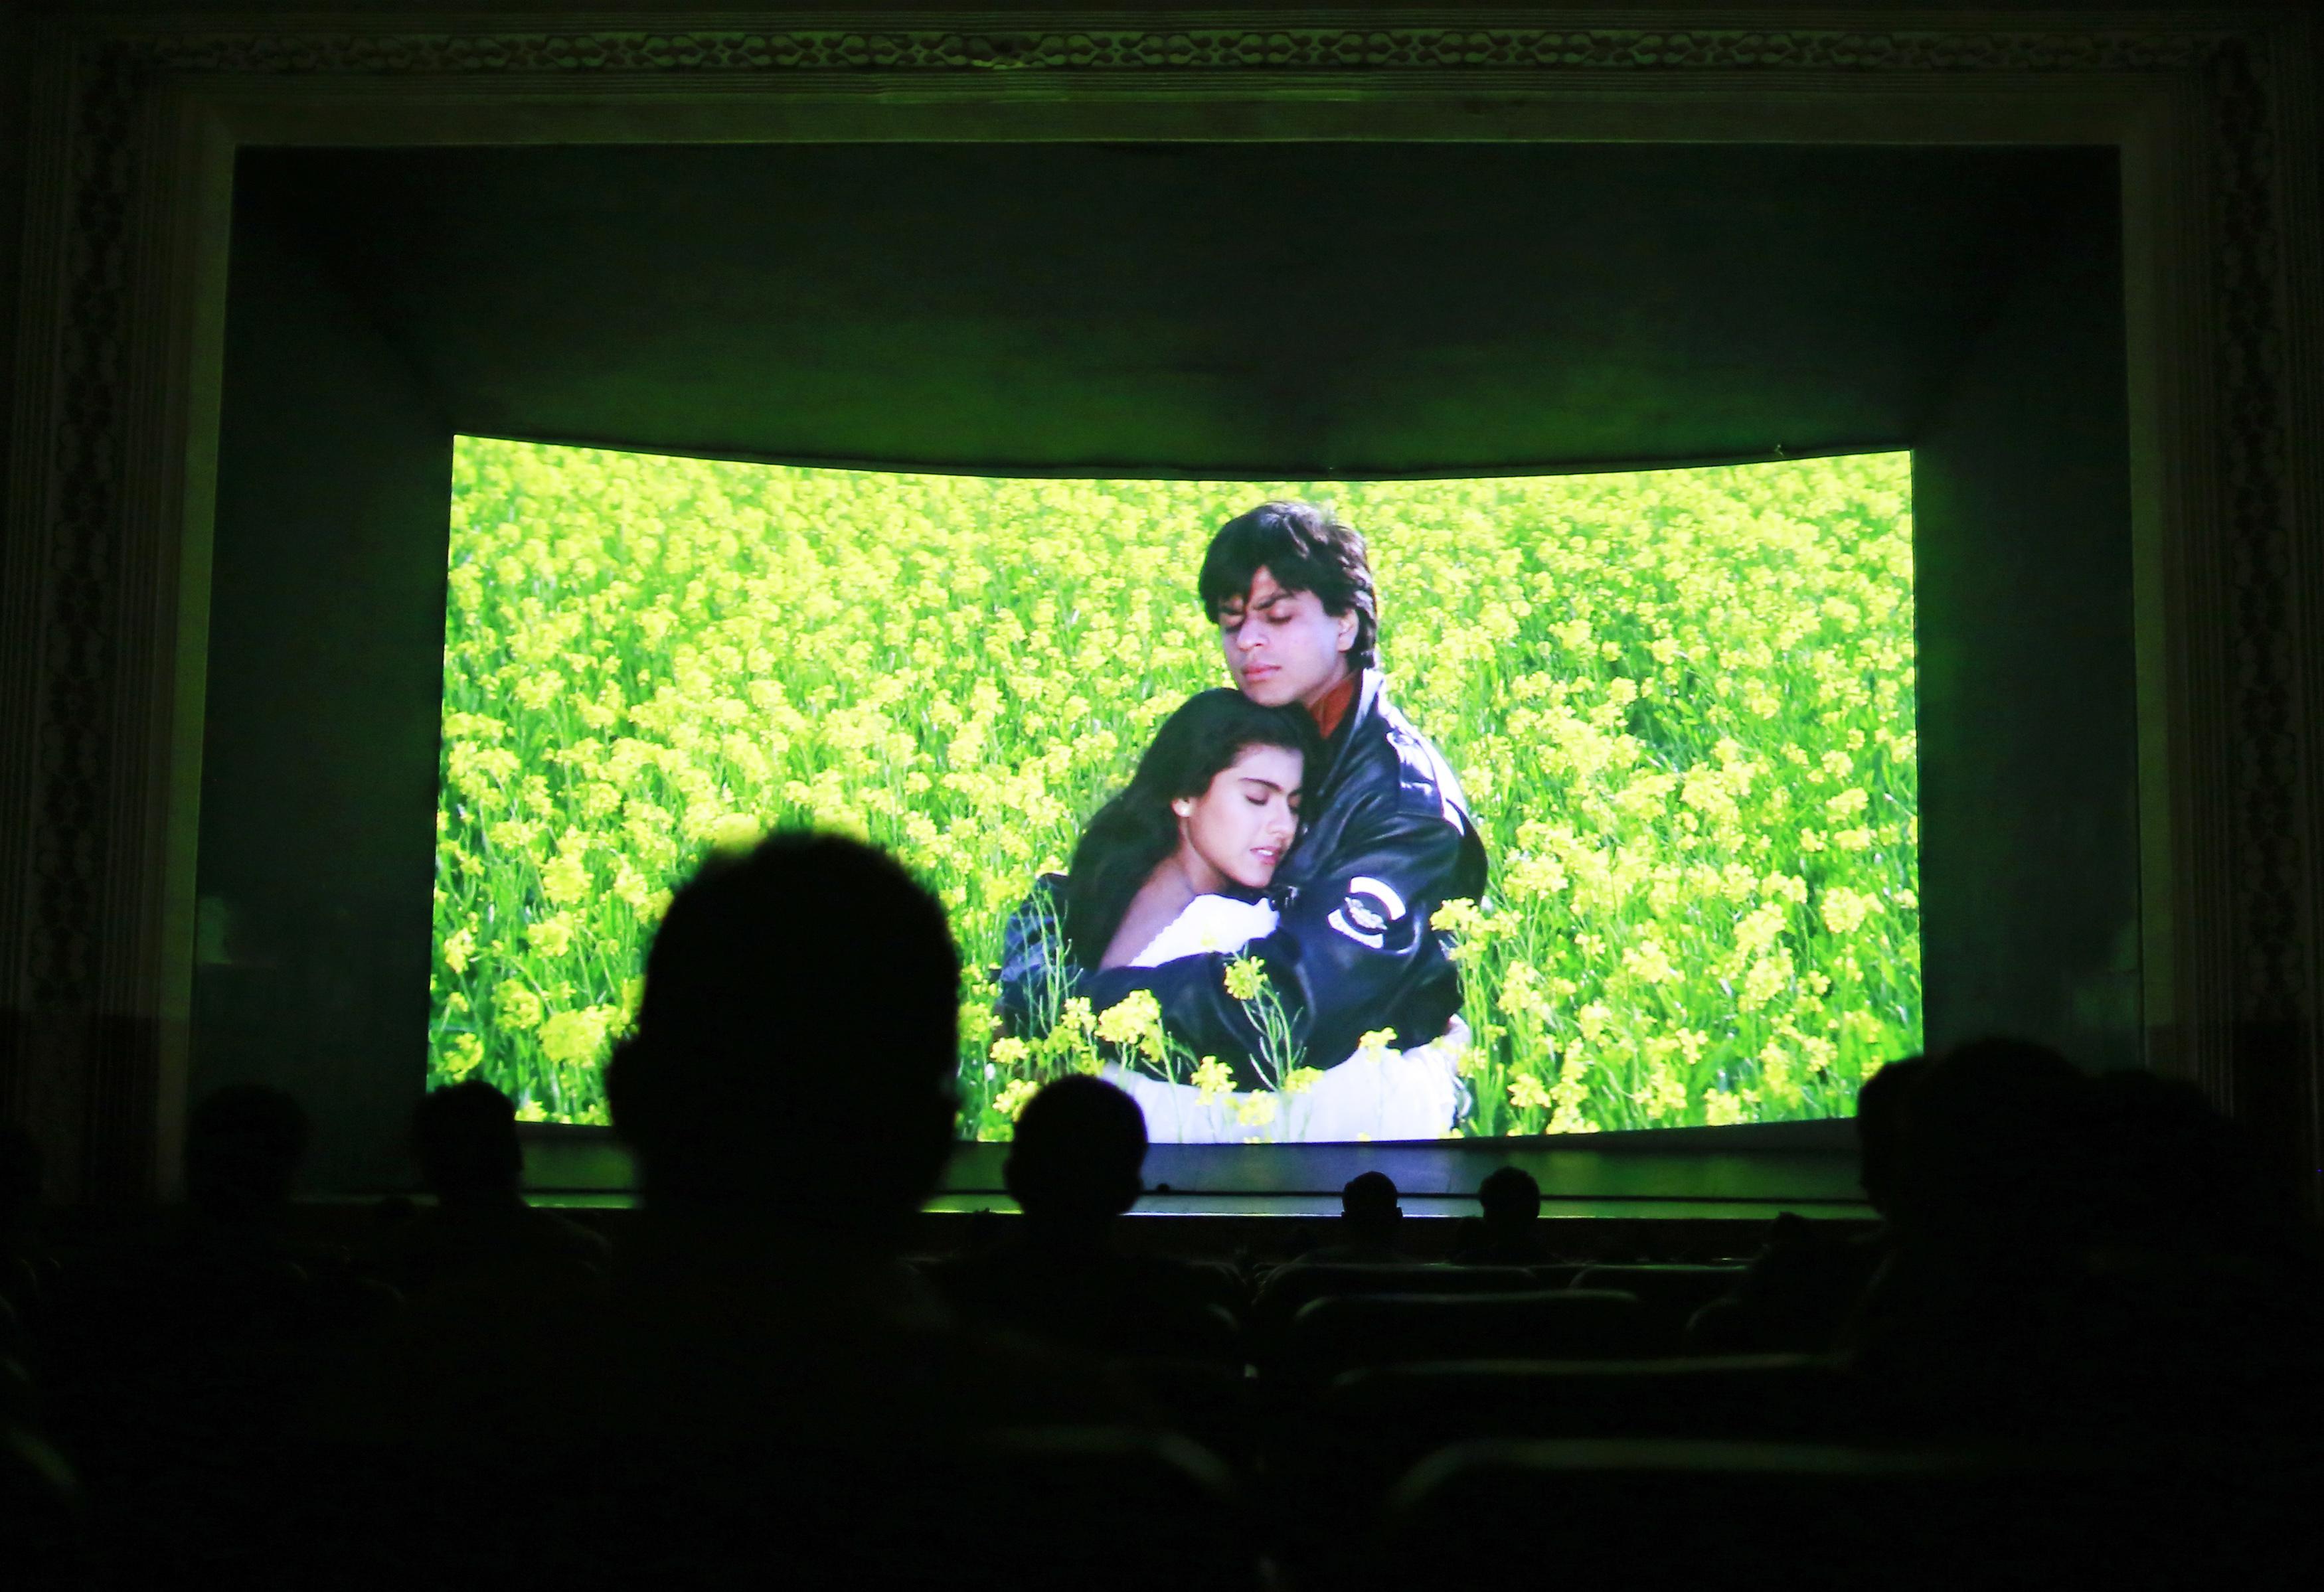 Inside the Mumbai theater, moviegoers look at the screen.